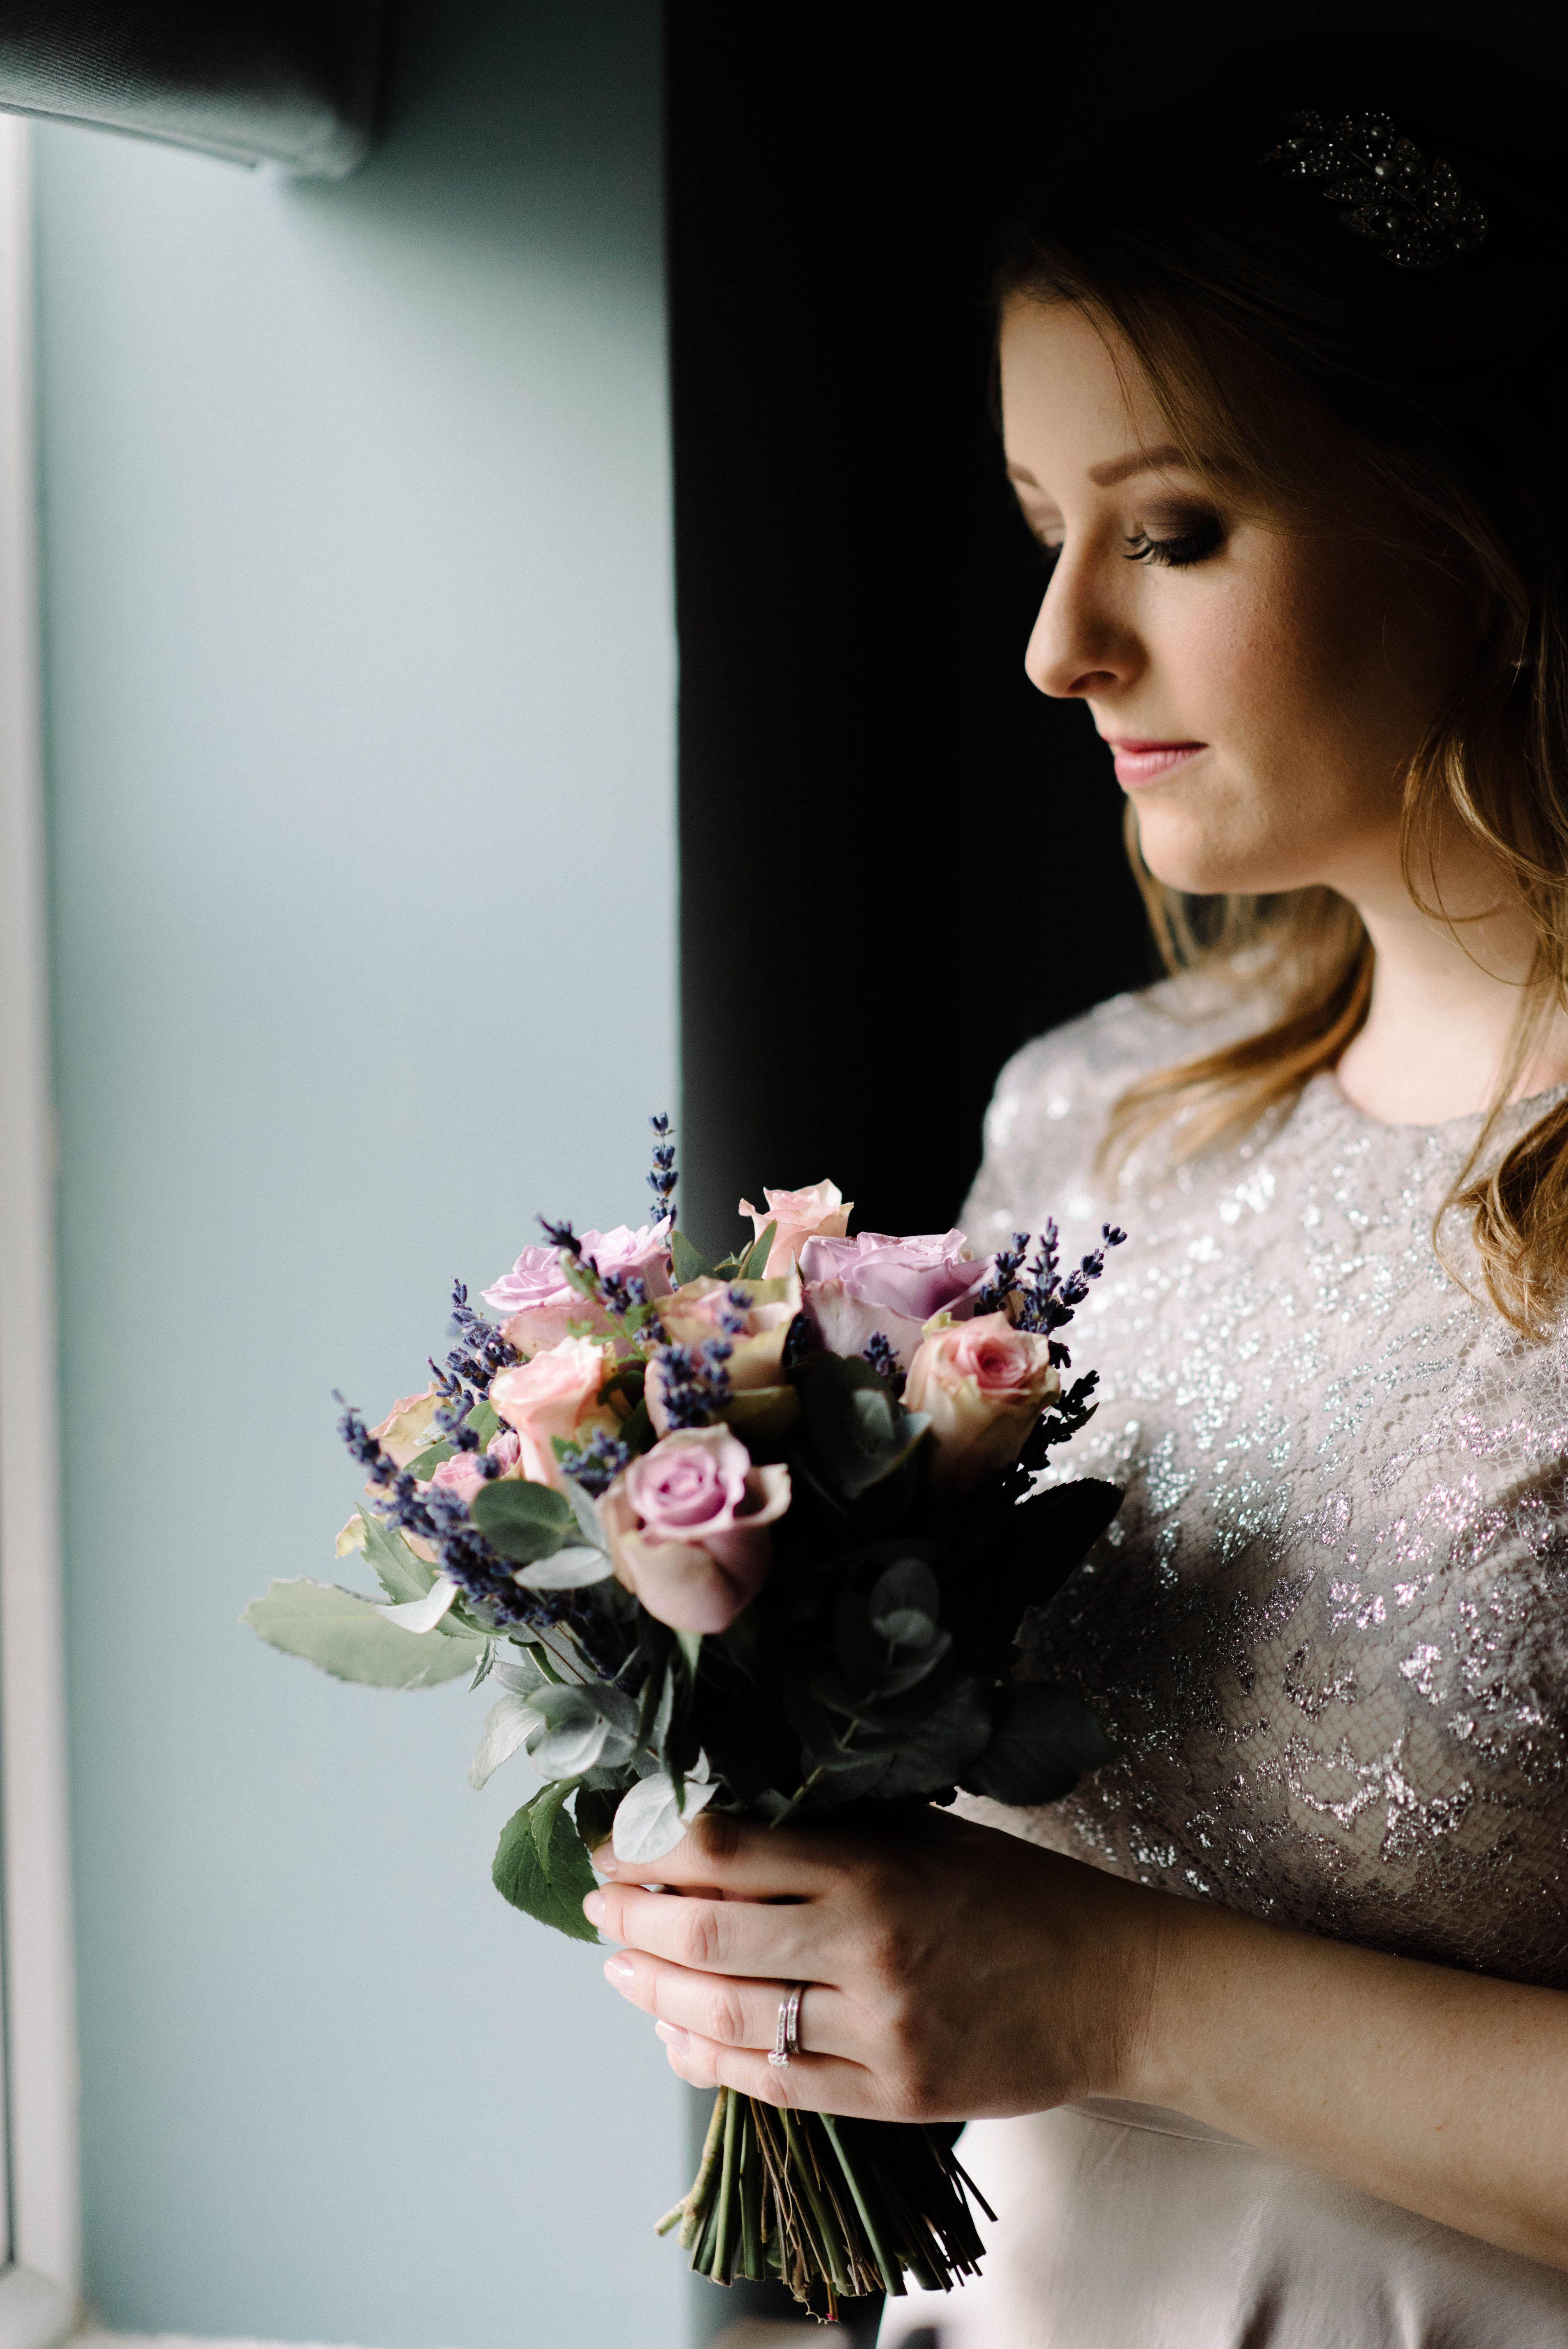 Using window light... Wedding flowers, wedding bouquet